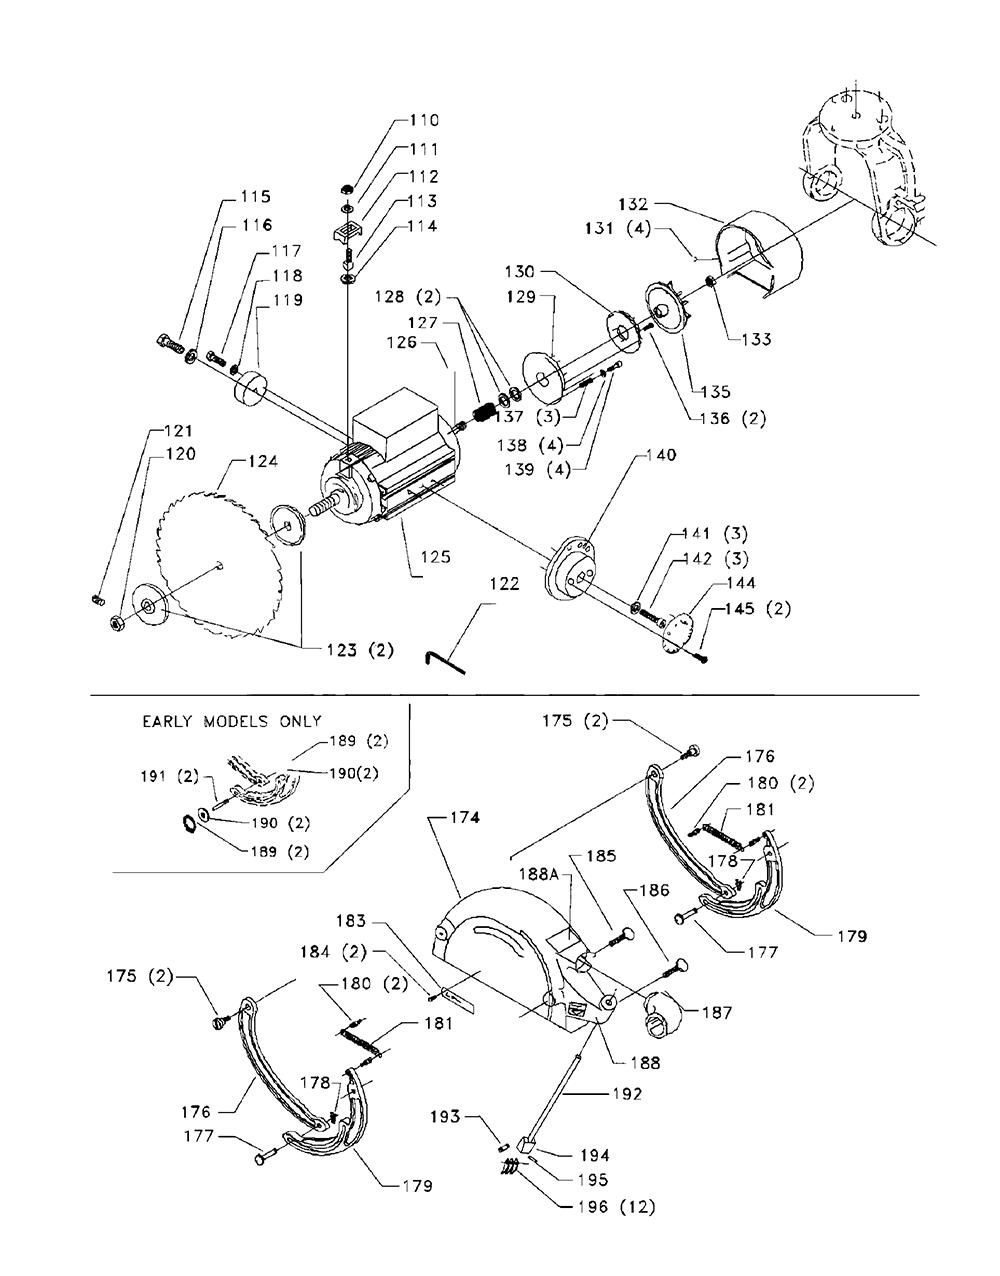 33-551-Delta-PB-1Break Down